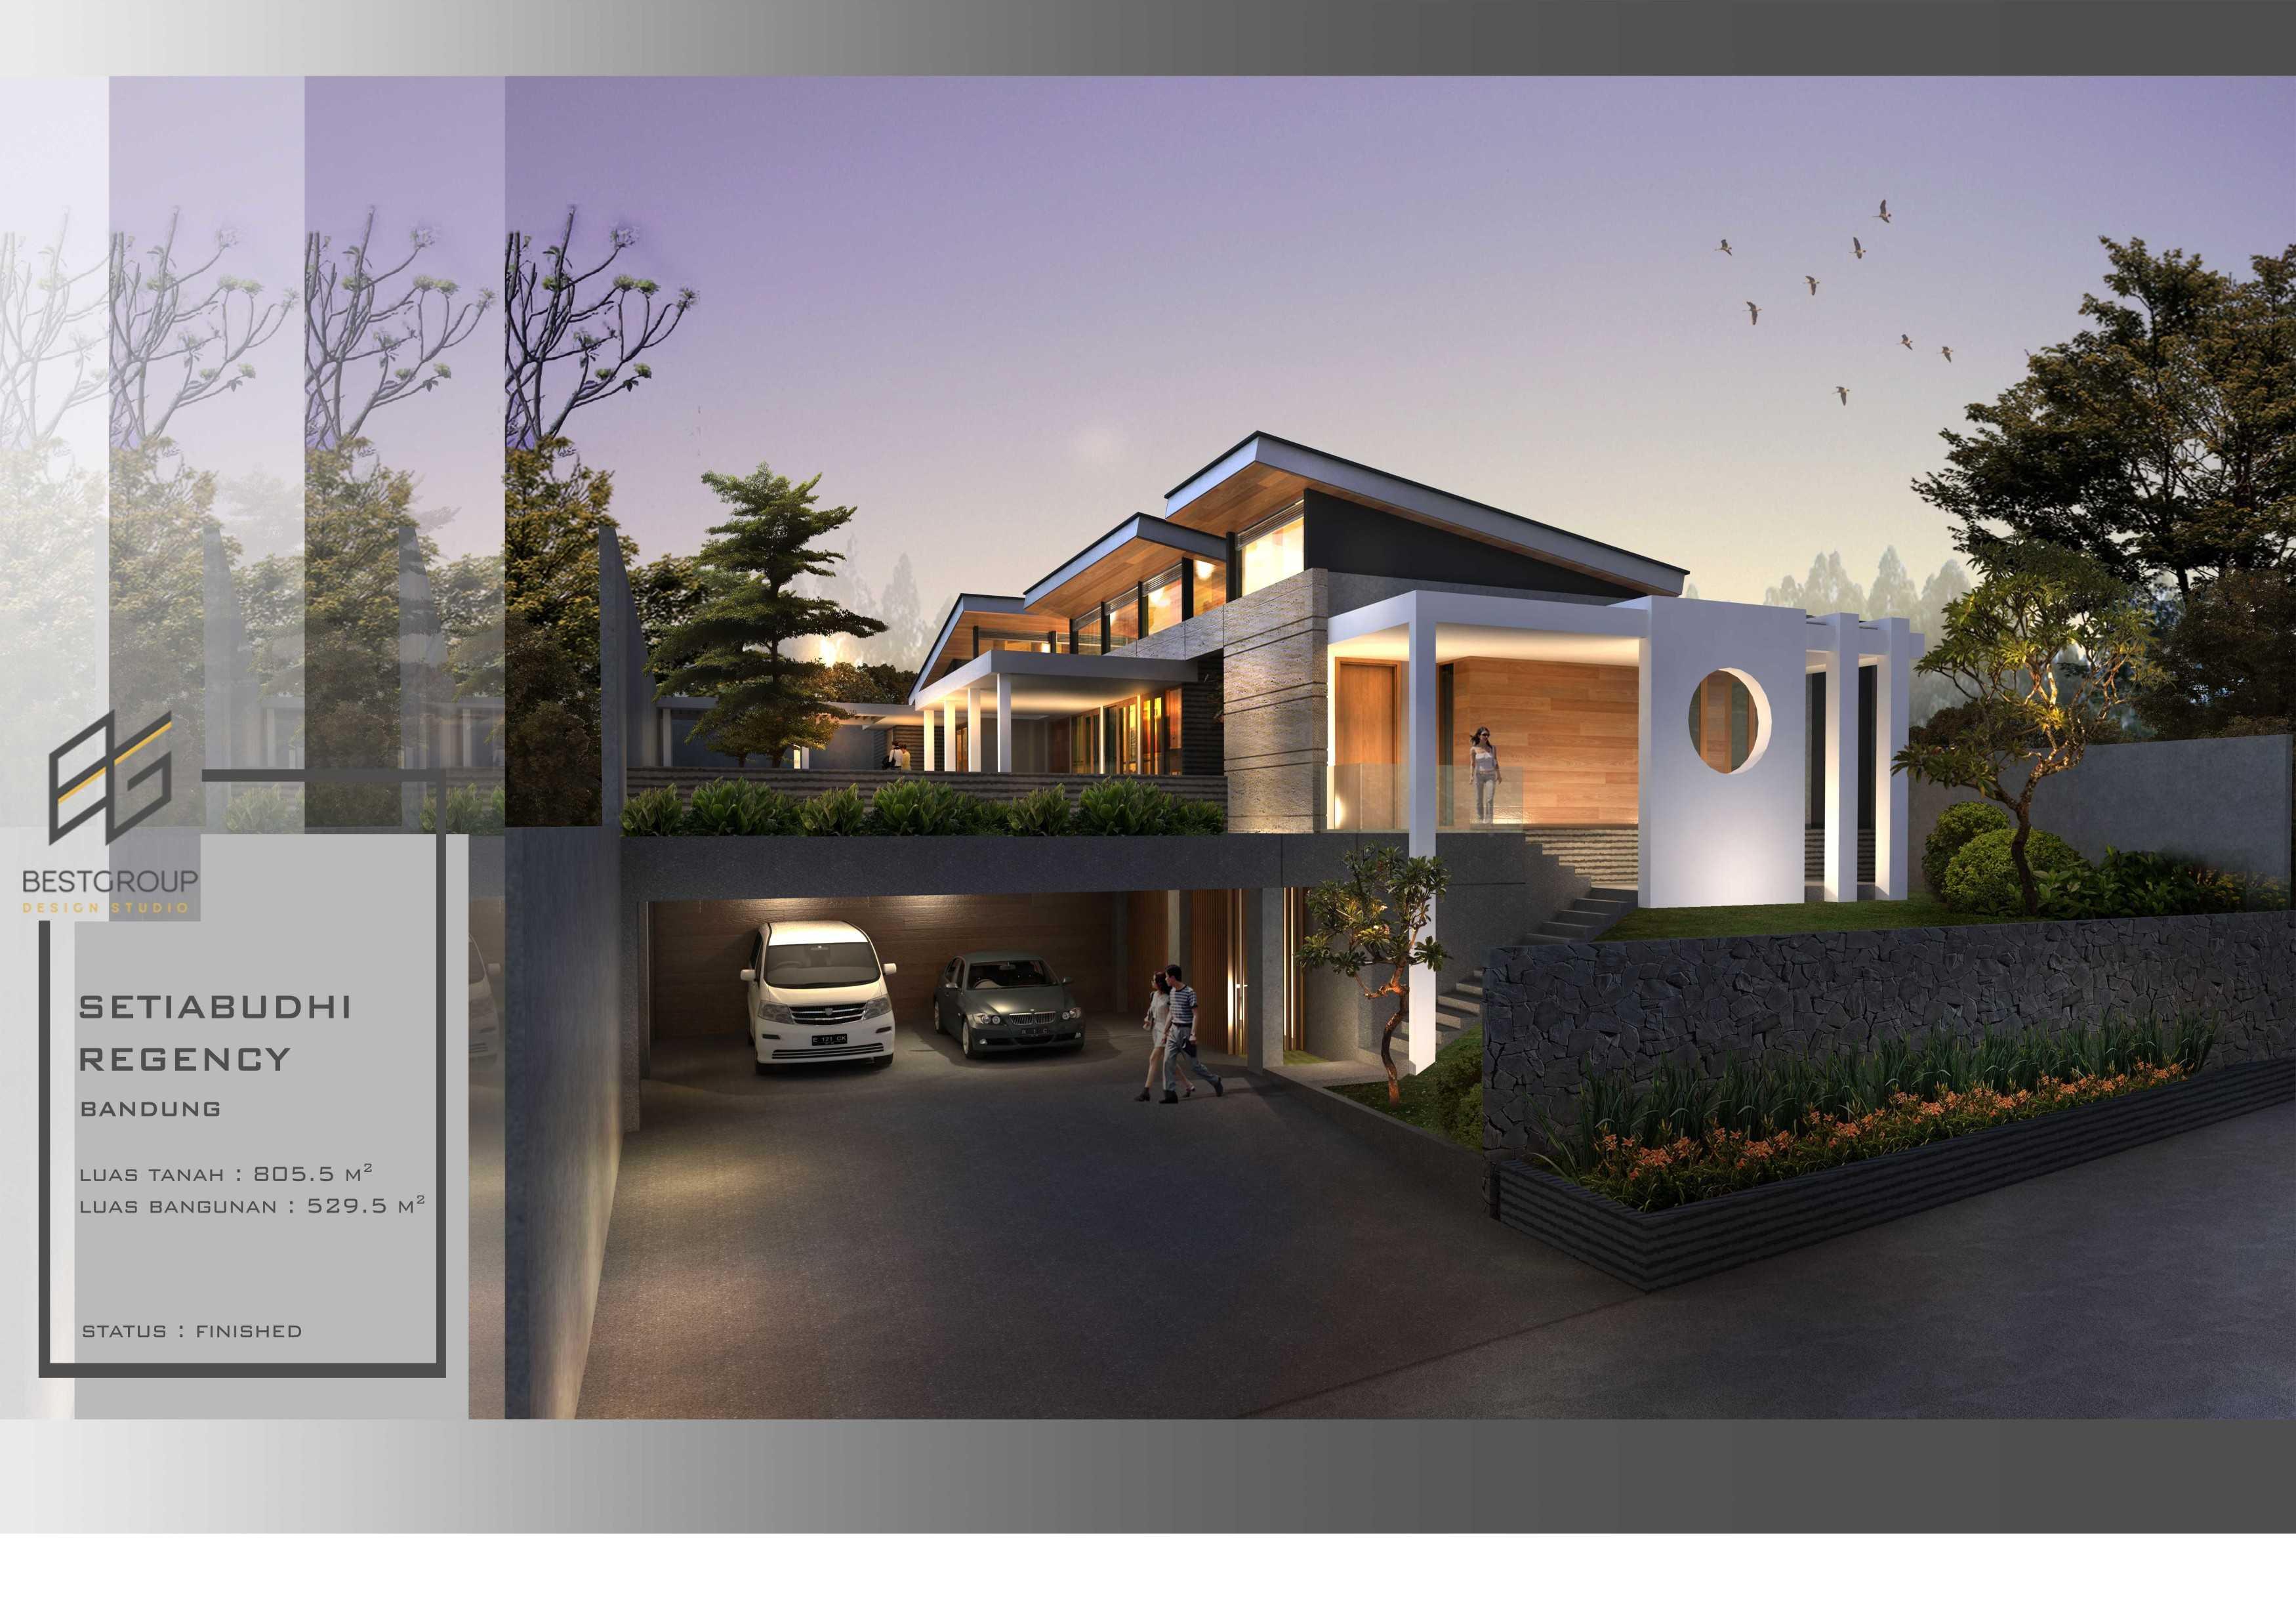 Best Group Design Studio Setiabudhi Regency House (Hq House) Bandung, Kota Bandung, Jawa Barat, Indonesia Bandung, Kota Bandung, Jawa Barat, Indonesia Best-Group-Design-Studio-Setiabudhi-Regency-House-Hq-House Modern  64286